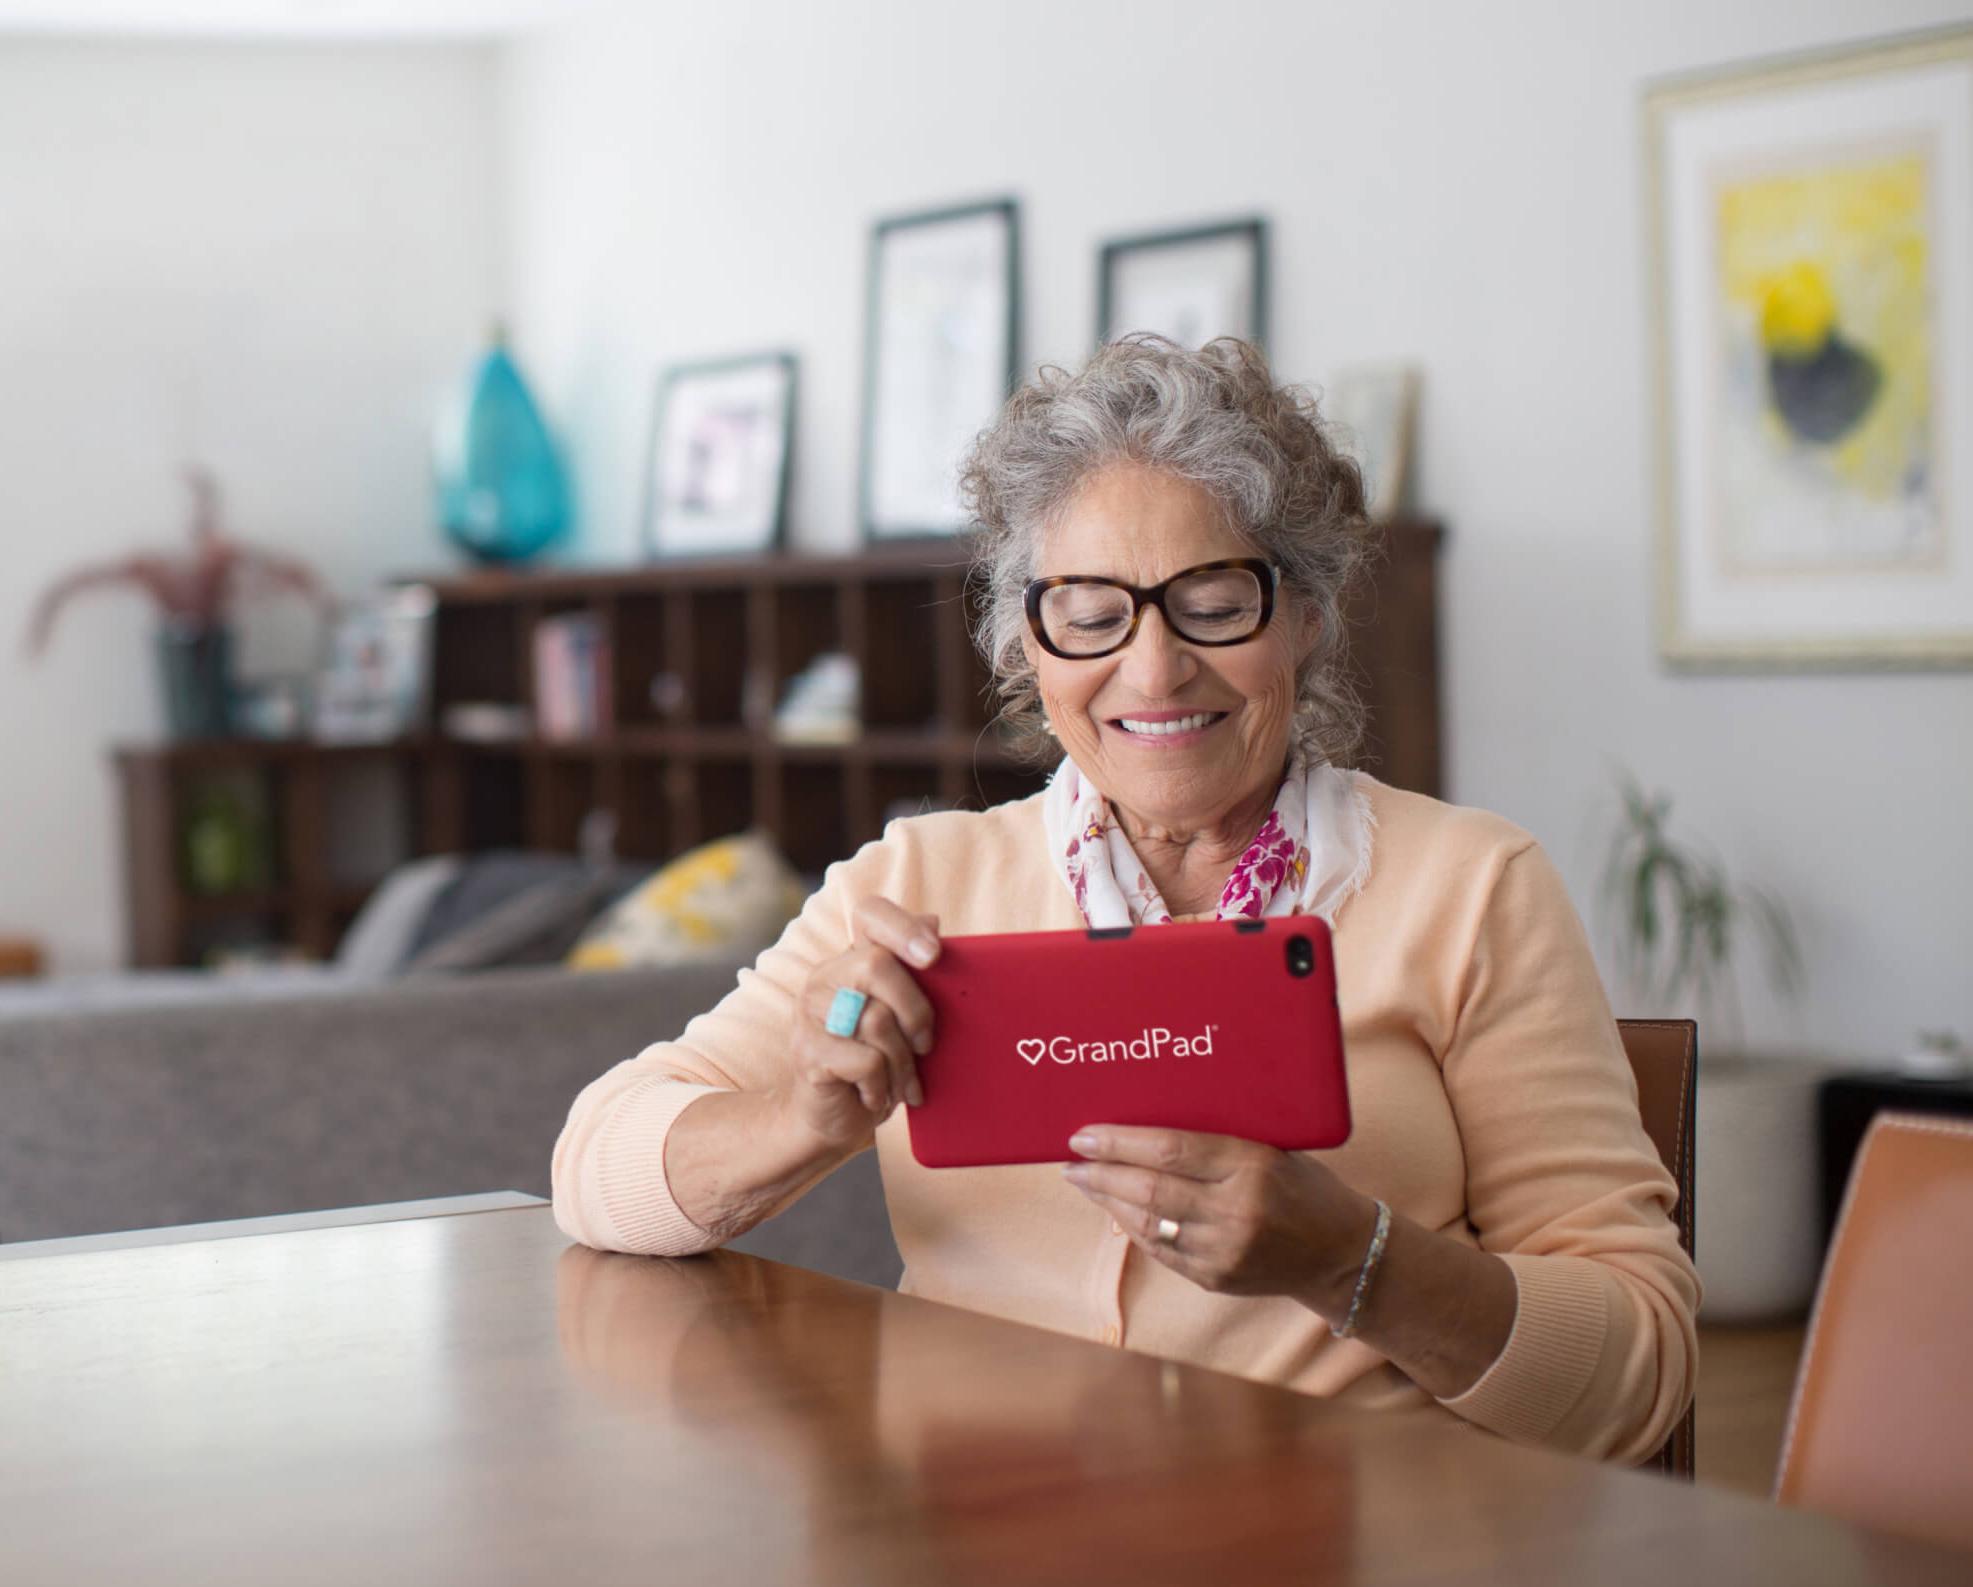 GrandPad user enjoying their GrandPad